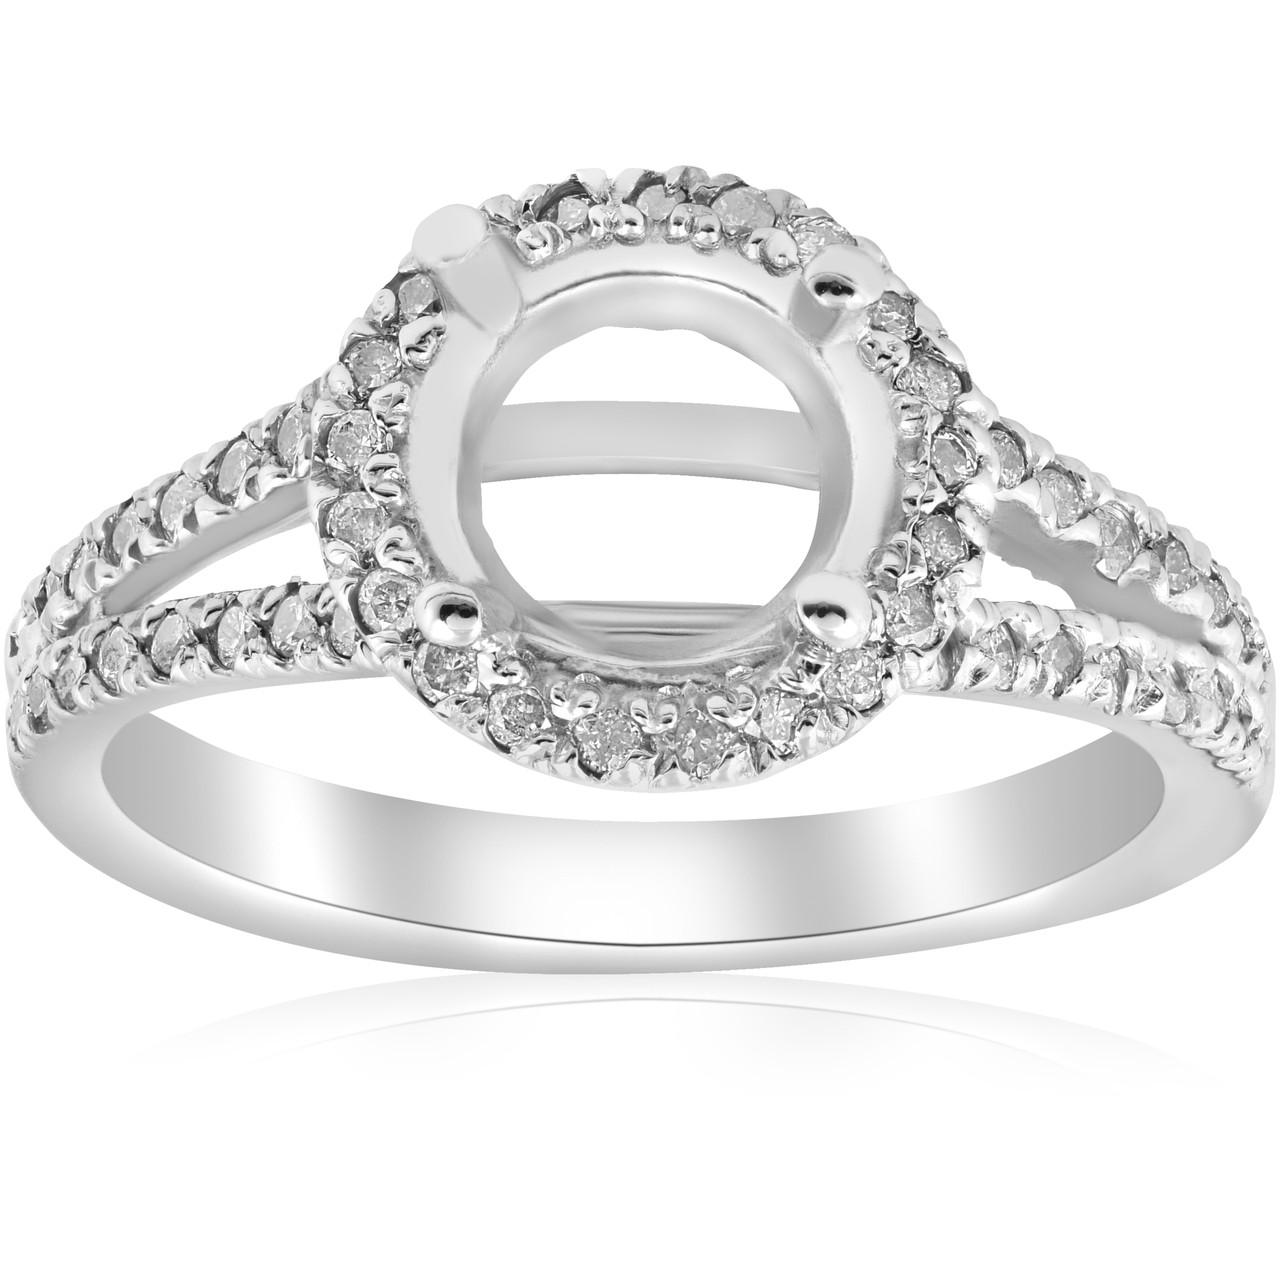 12ct halo split shank diamond engagement ring setting 14k white gold semi mount hi i1 i2 - Wedding Ring Setting